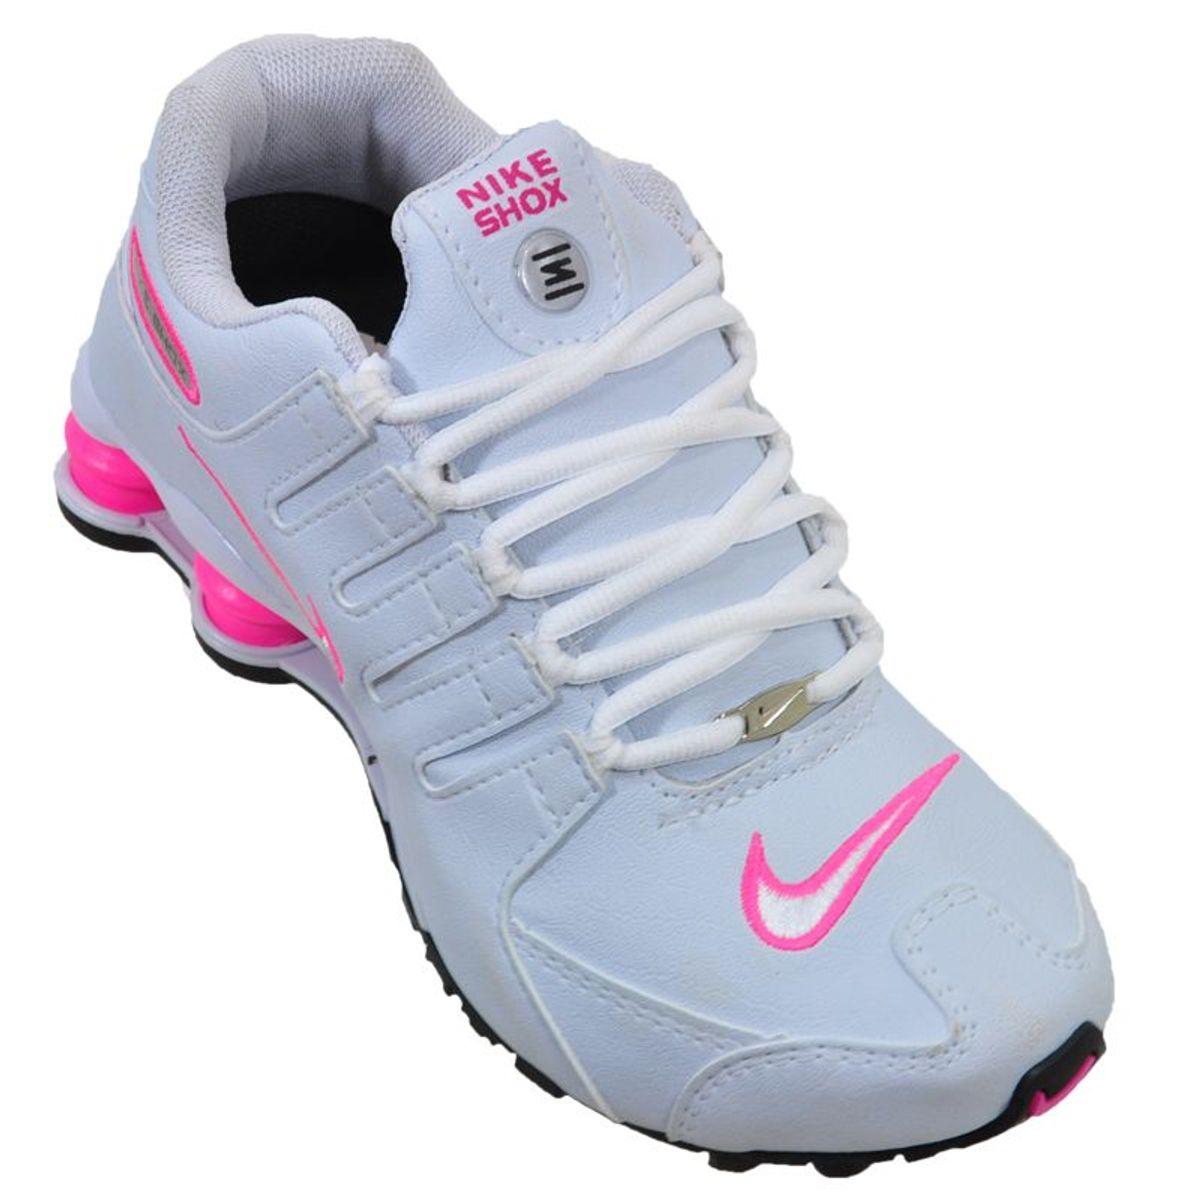 b24971de2a105 Tenis Nike Shox Nz Feminino Numero 35 | Tênis Feminino Nike Nunca Usado  31750402 | enjoei